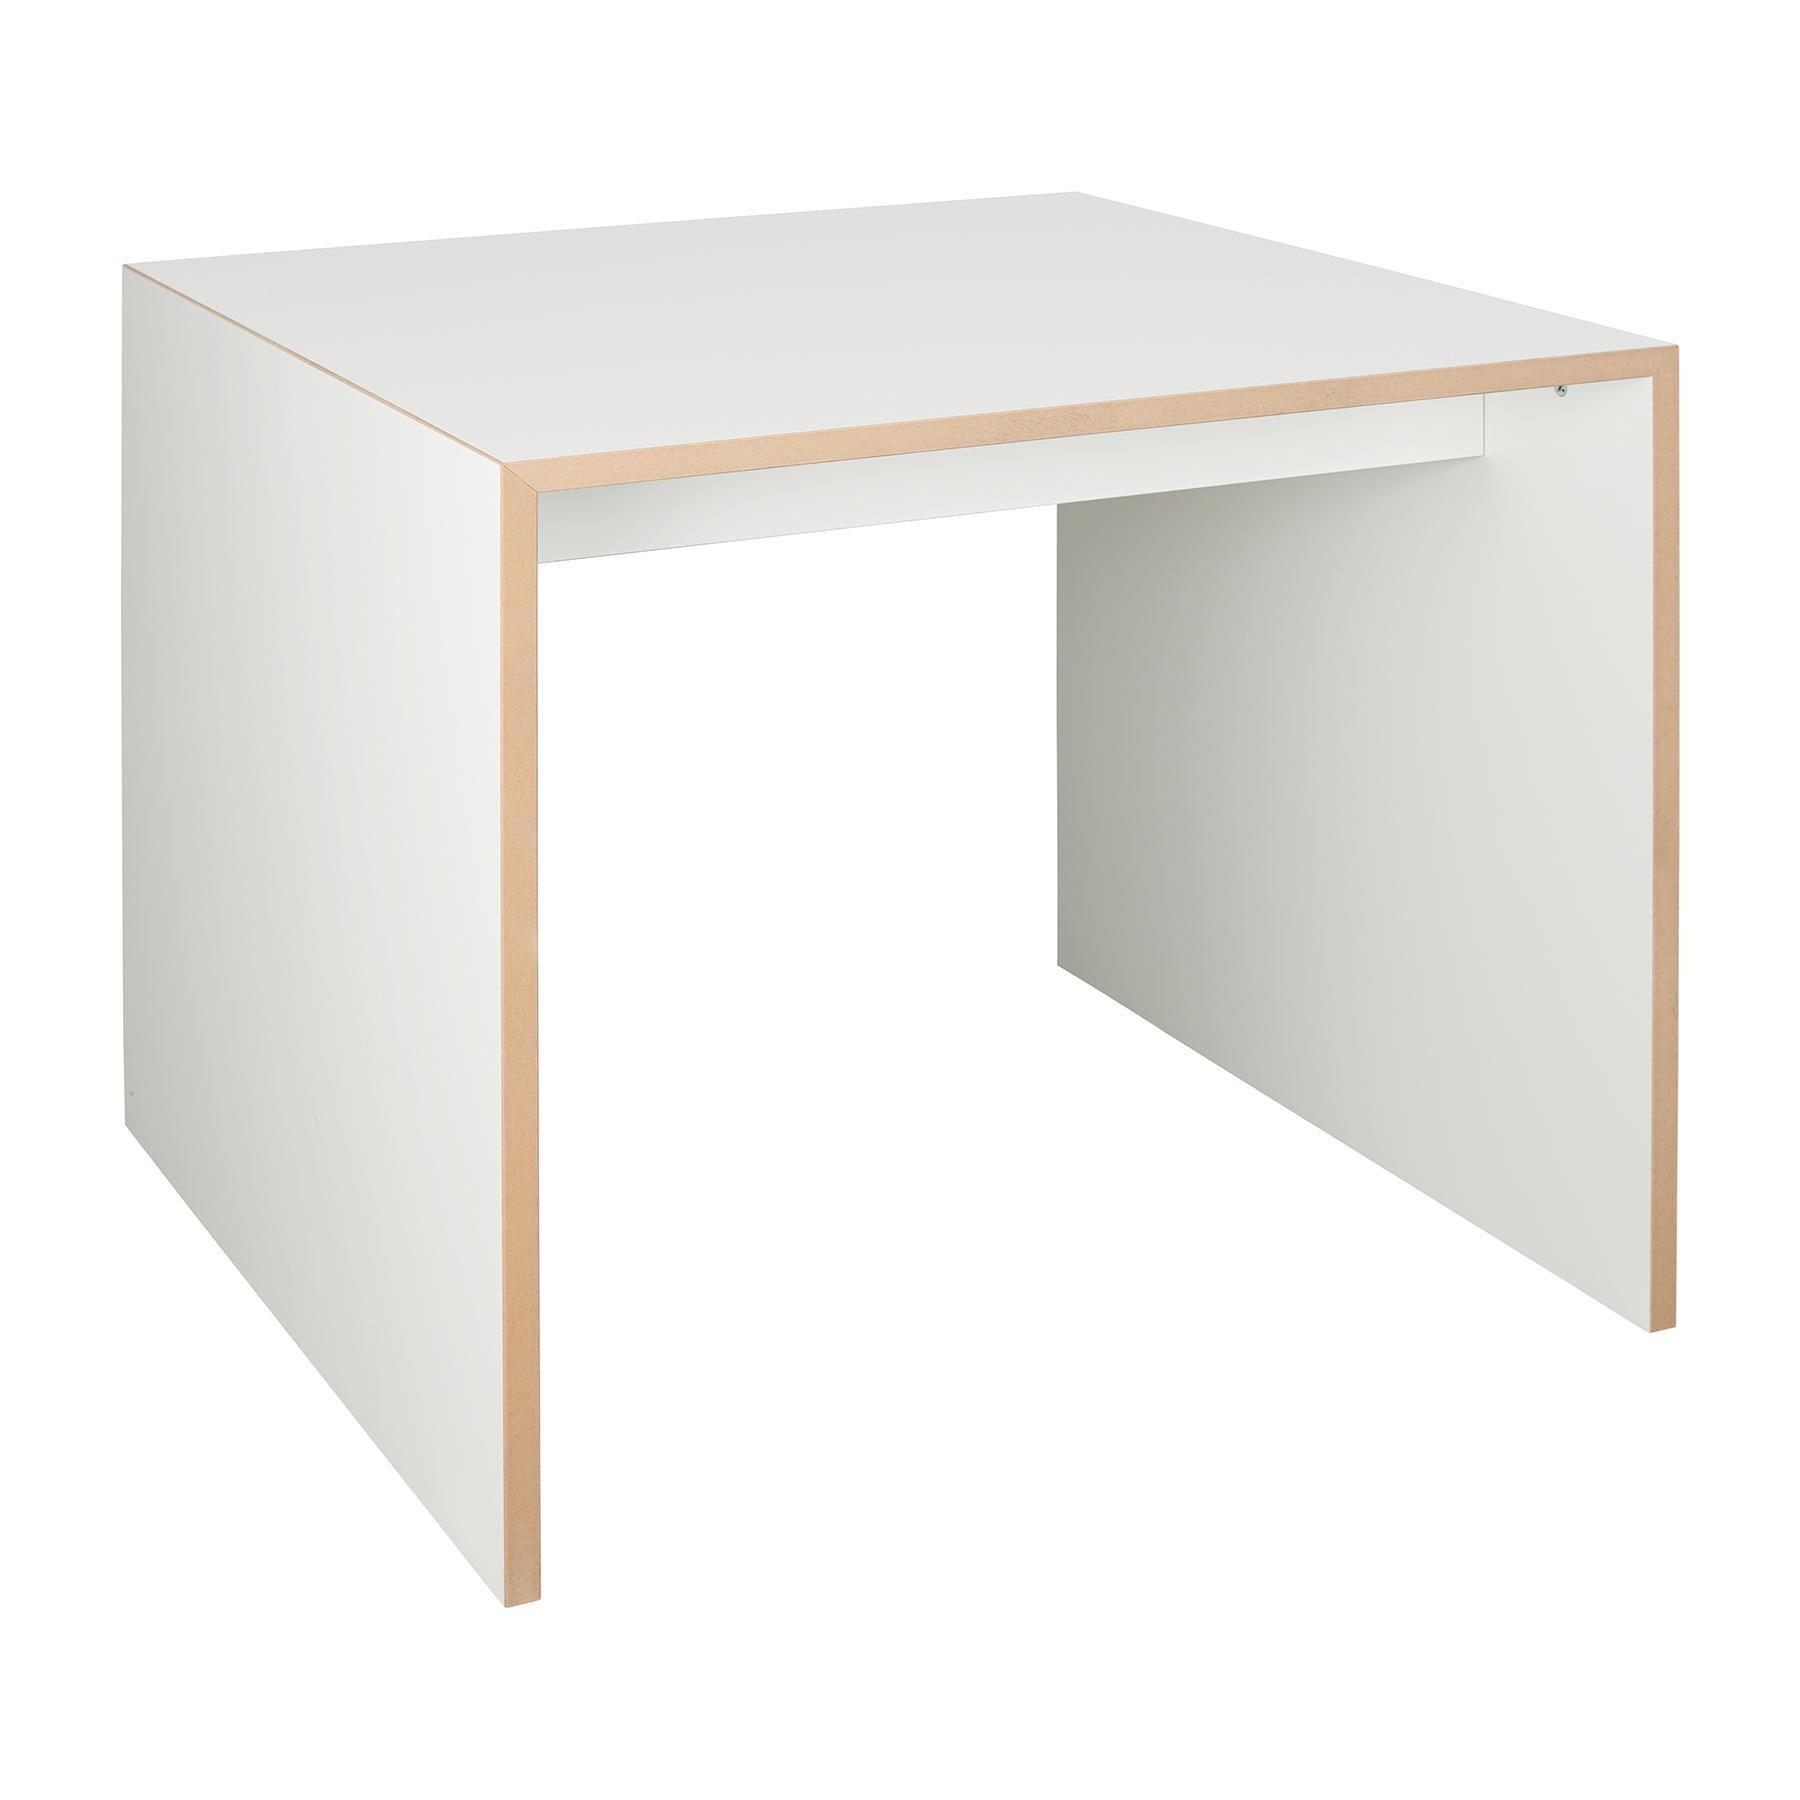 Freistell Table Small 80x80cm